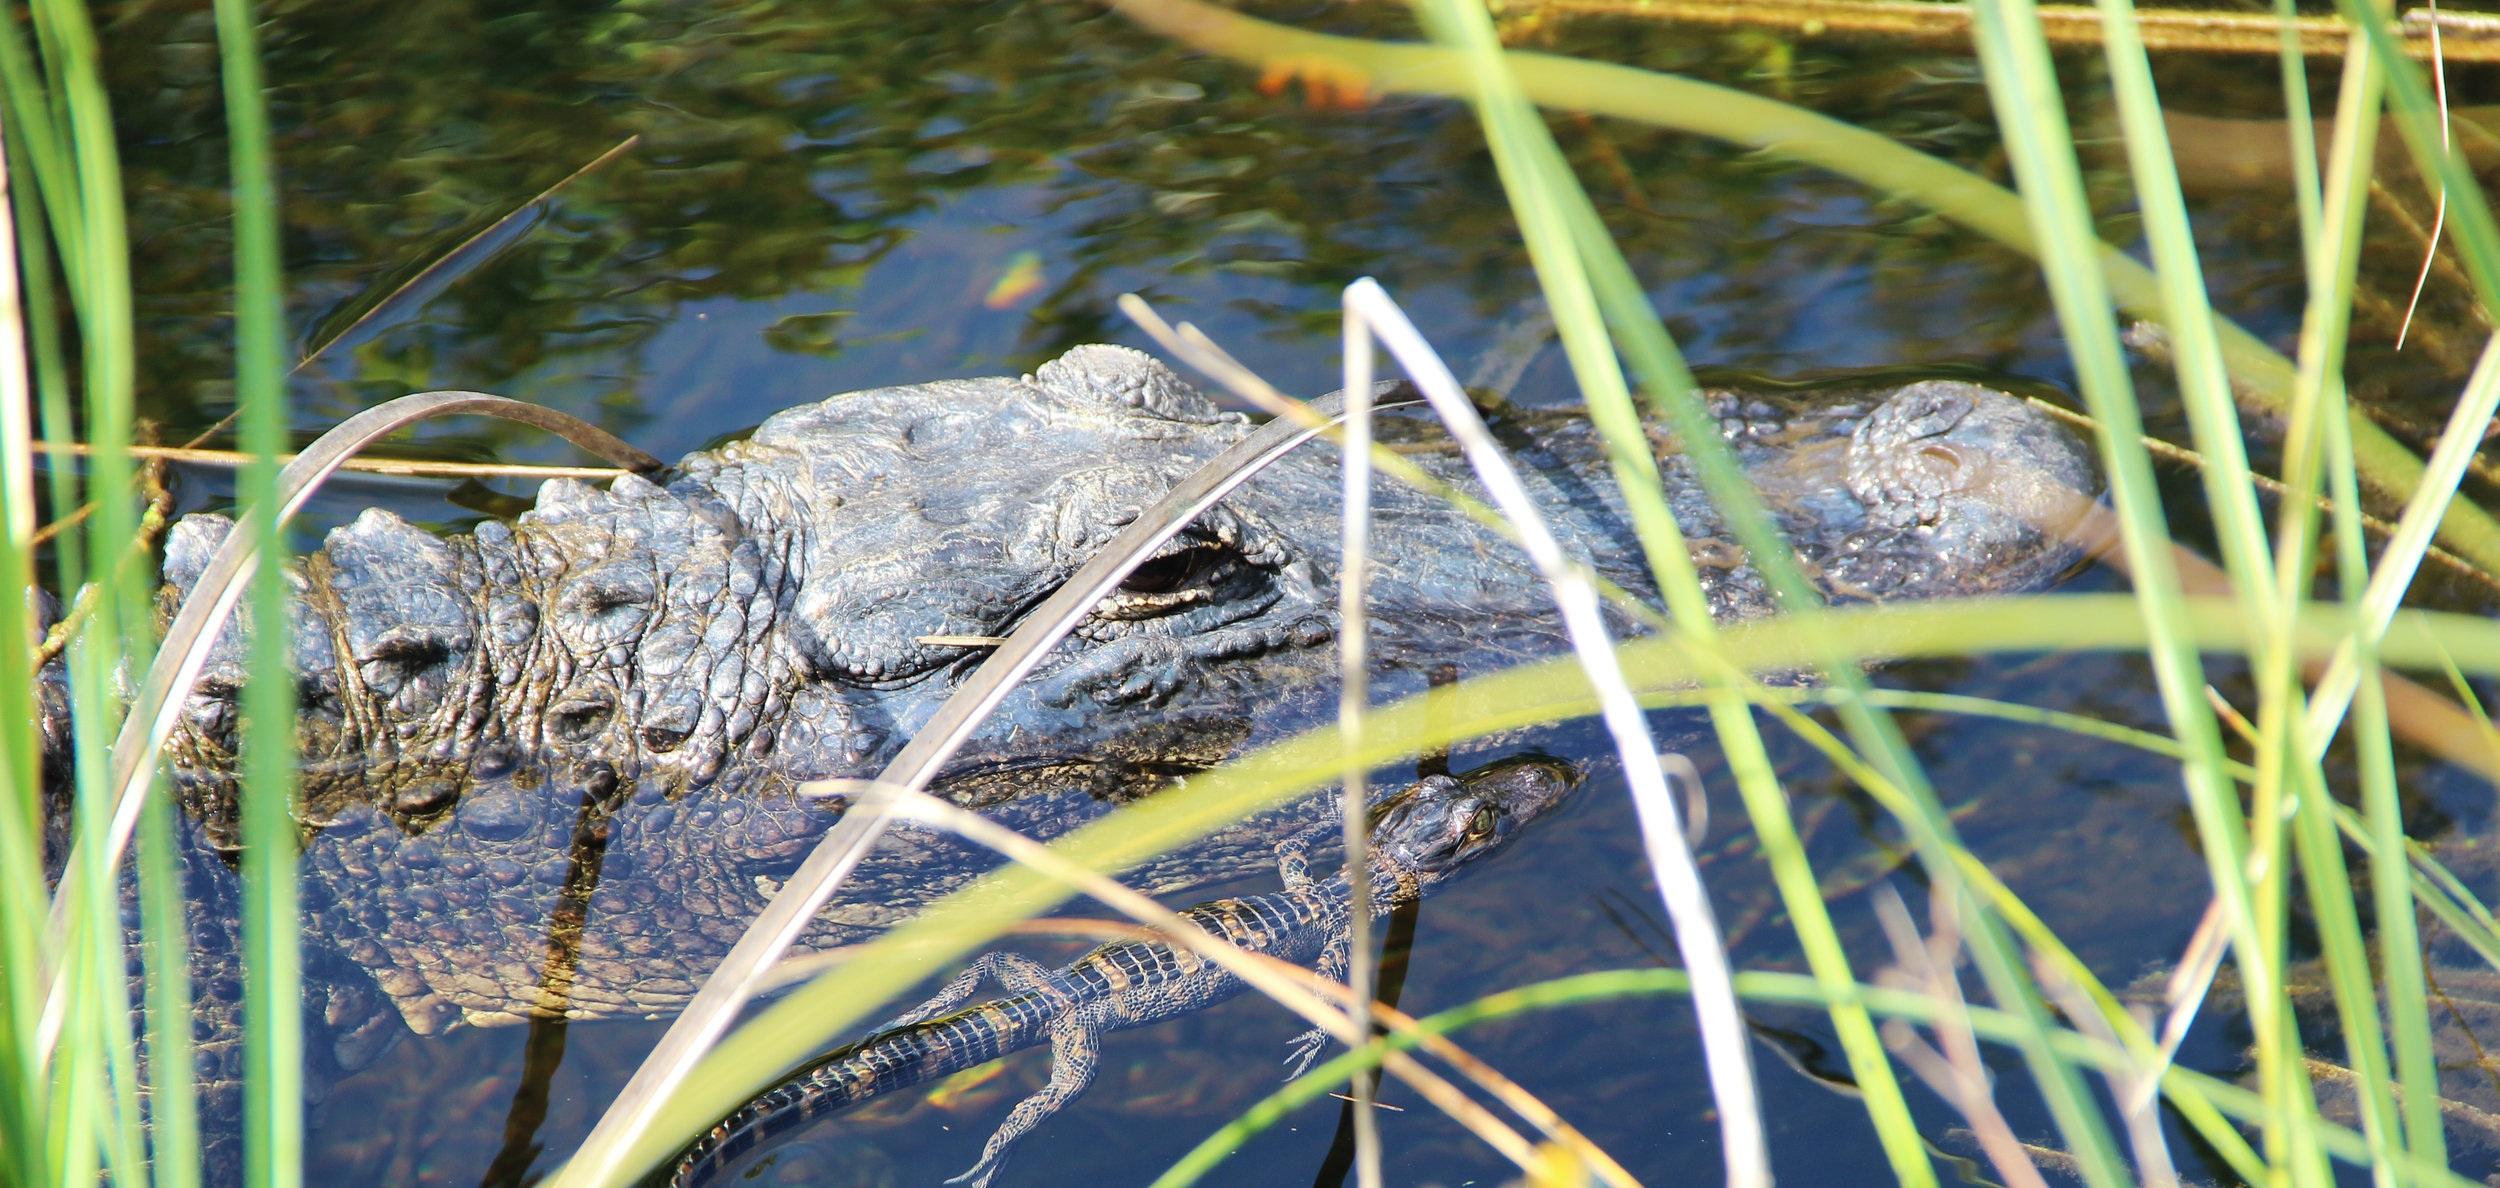 Airboat Everglades & Grasslands Tour